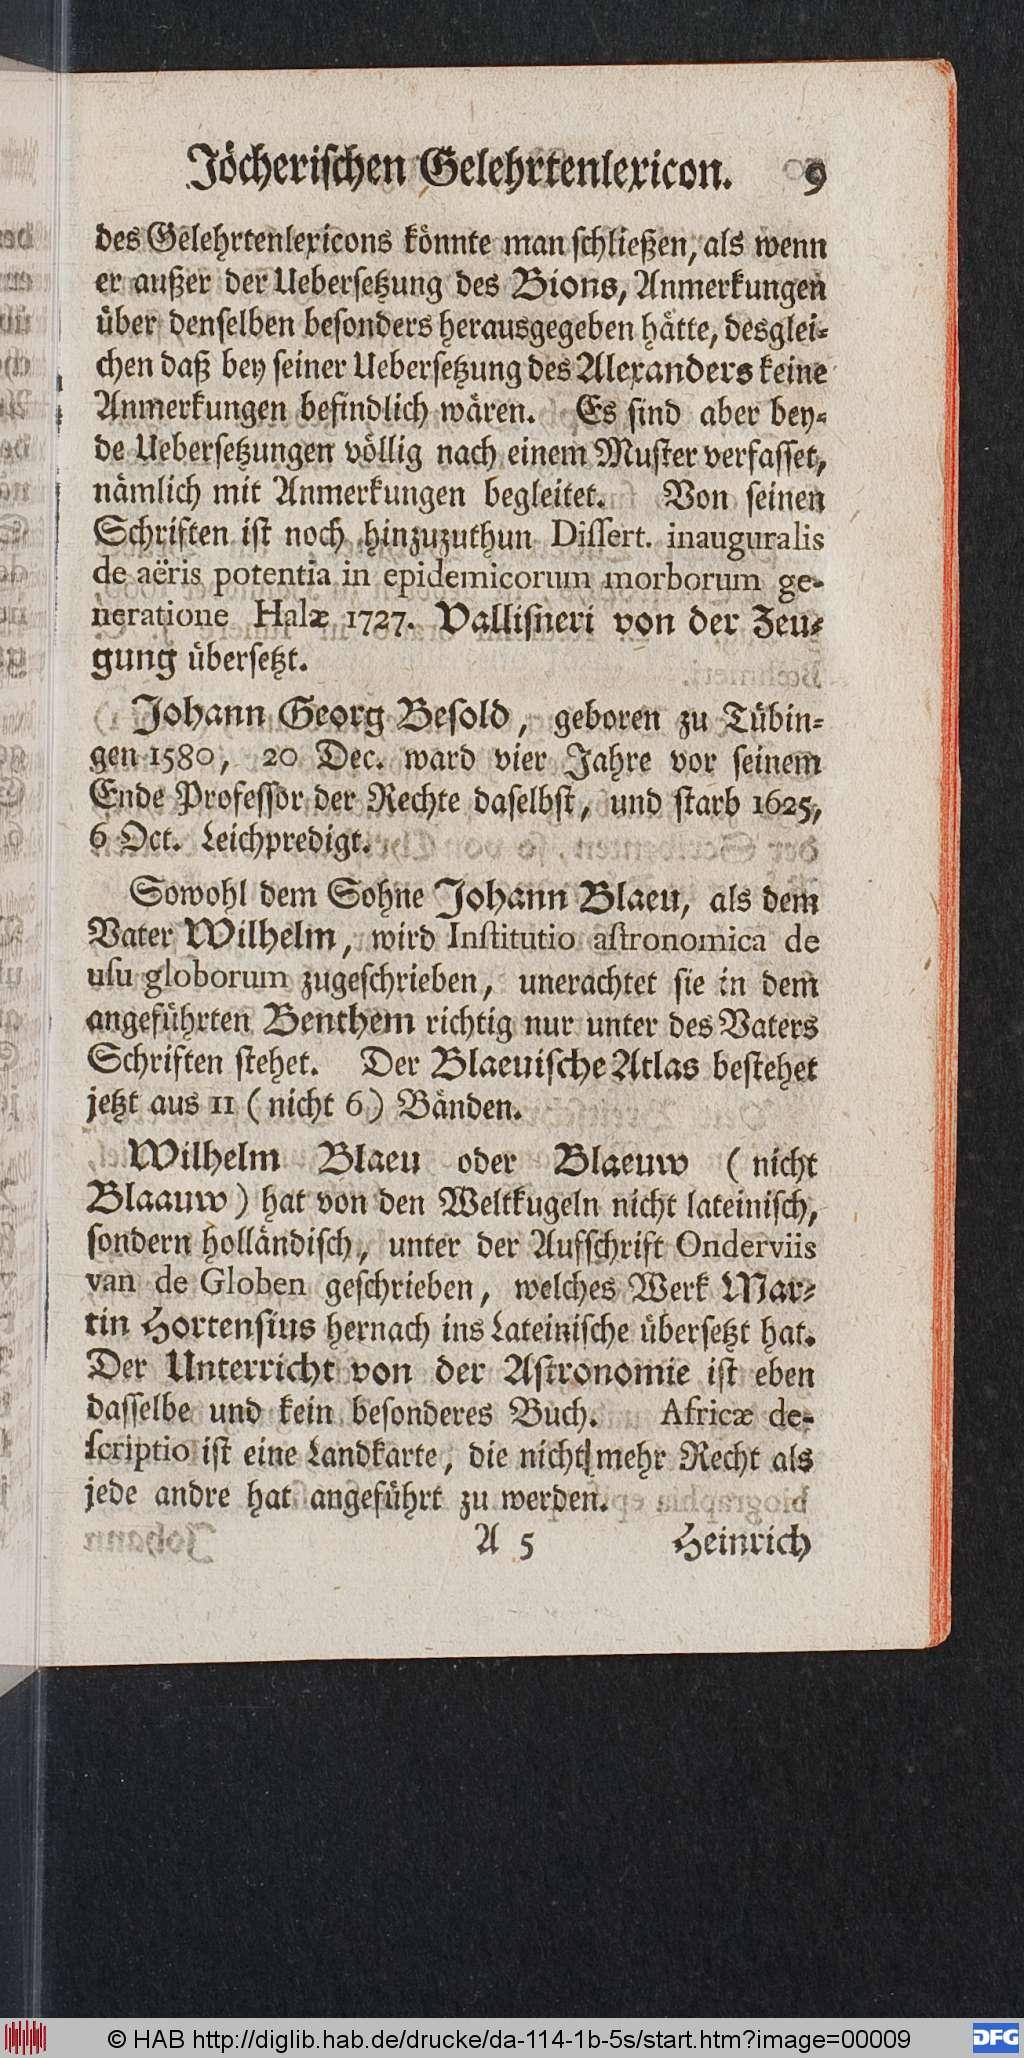 http://diglib.hab.de/drucke/da-114-1b-5s/00009.jpg